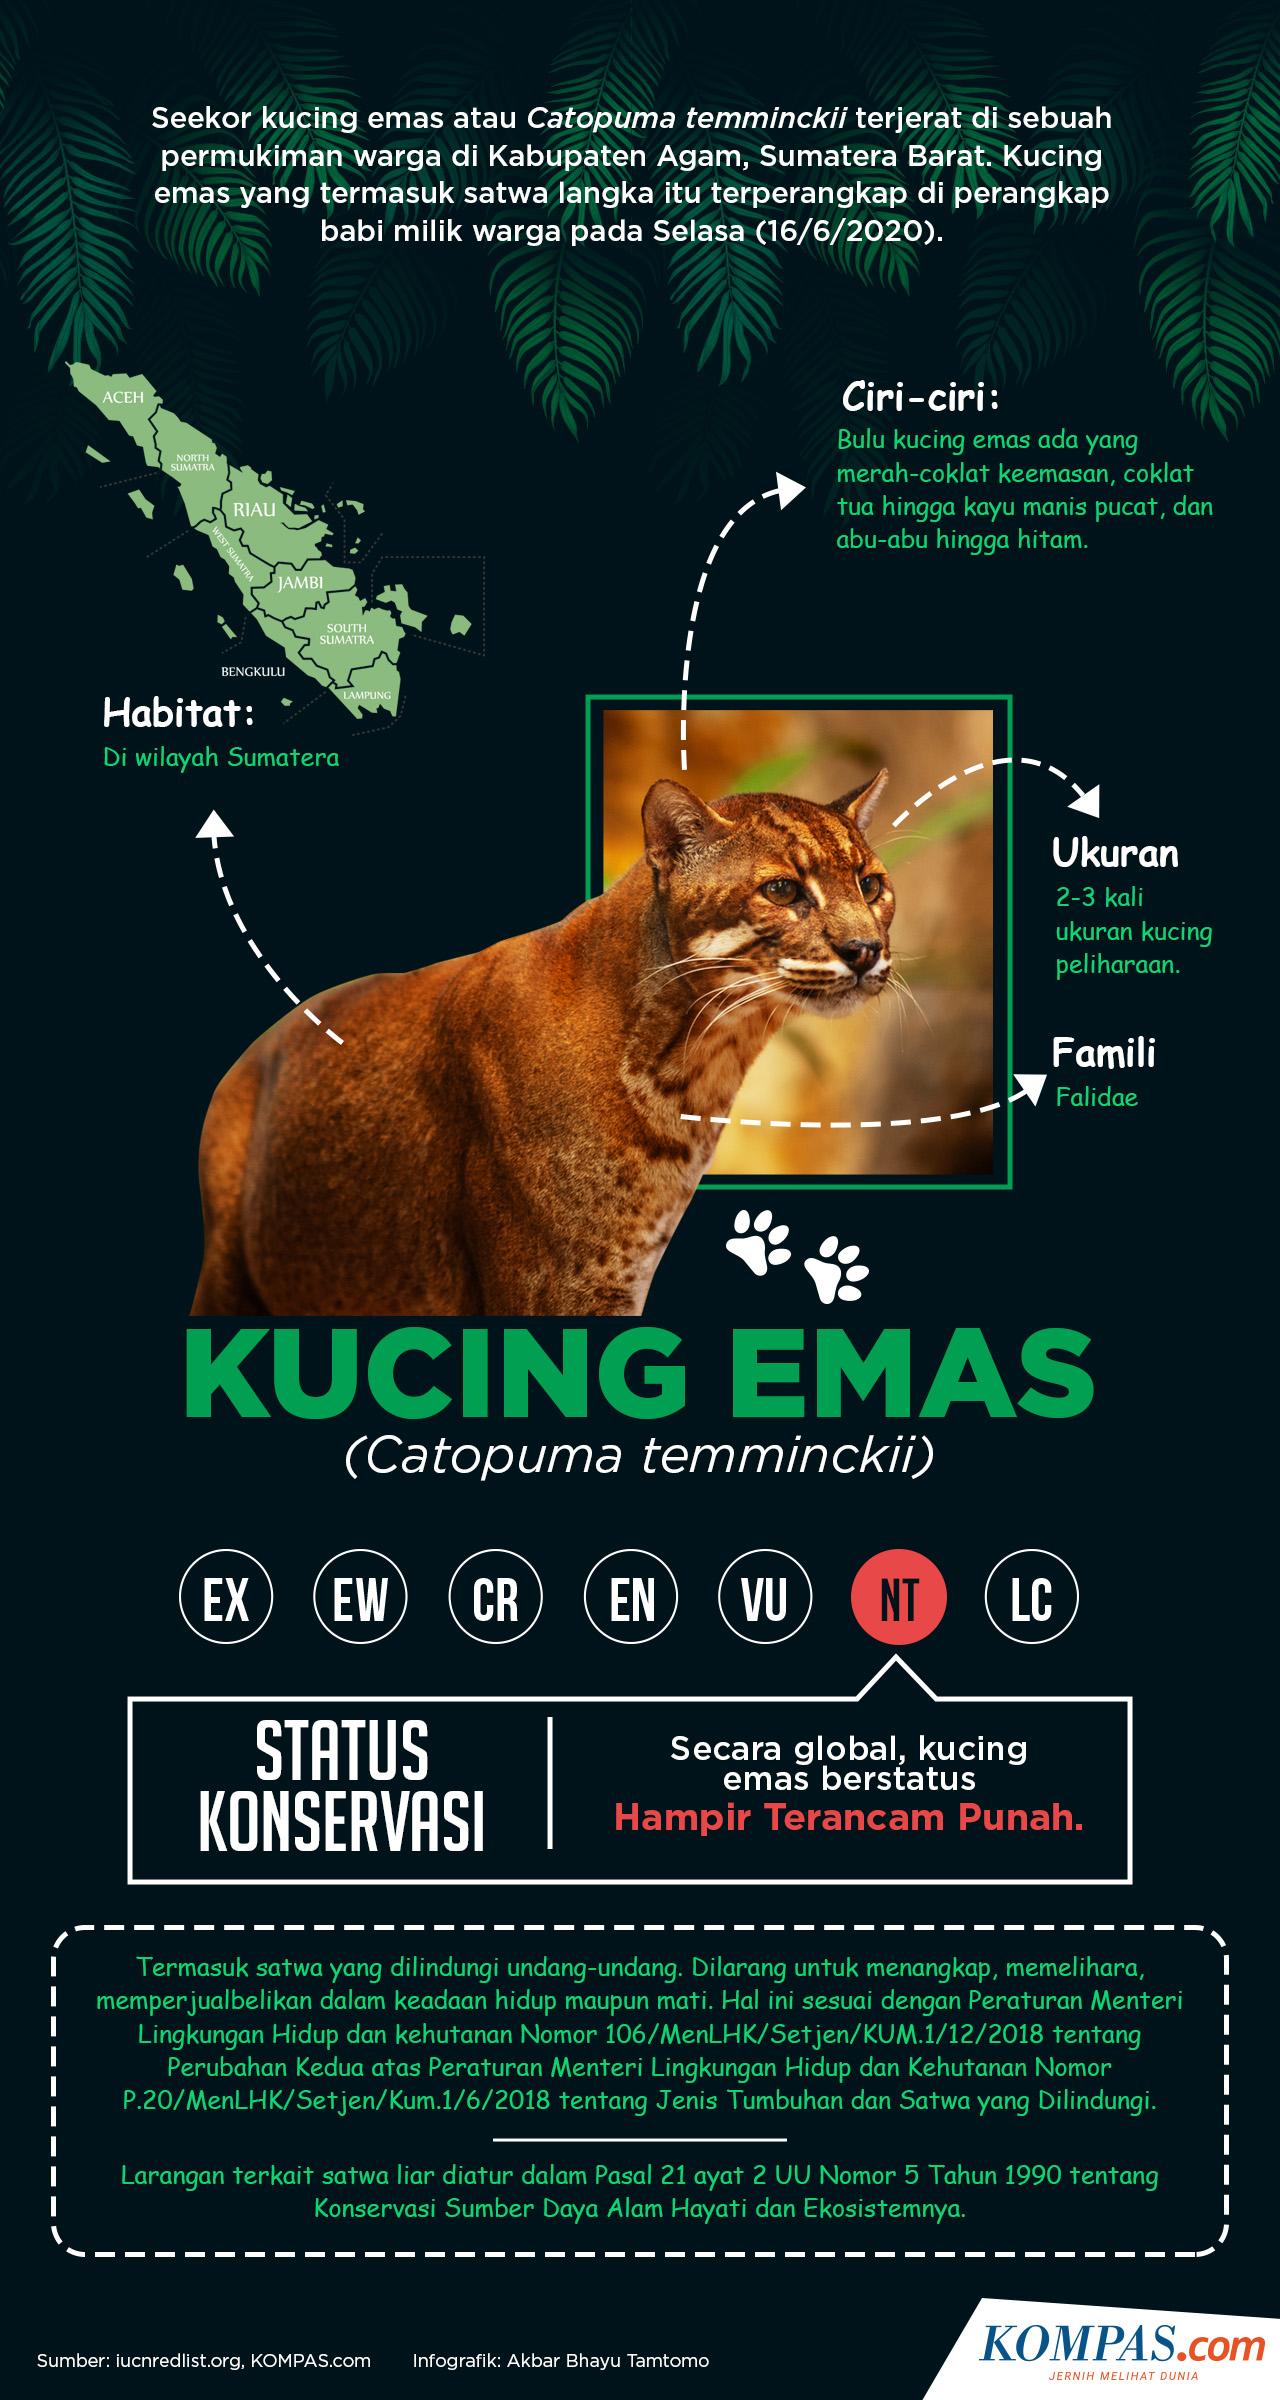 Infografik Mengenal Kucing Emas Spesies Langka Yang Hampir Terancam Punah